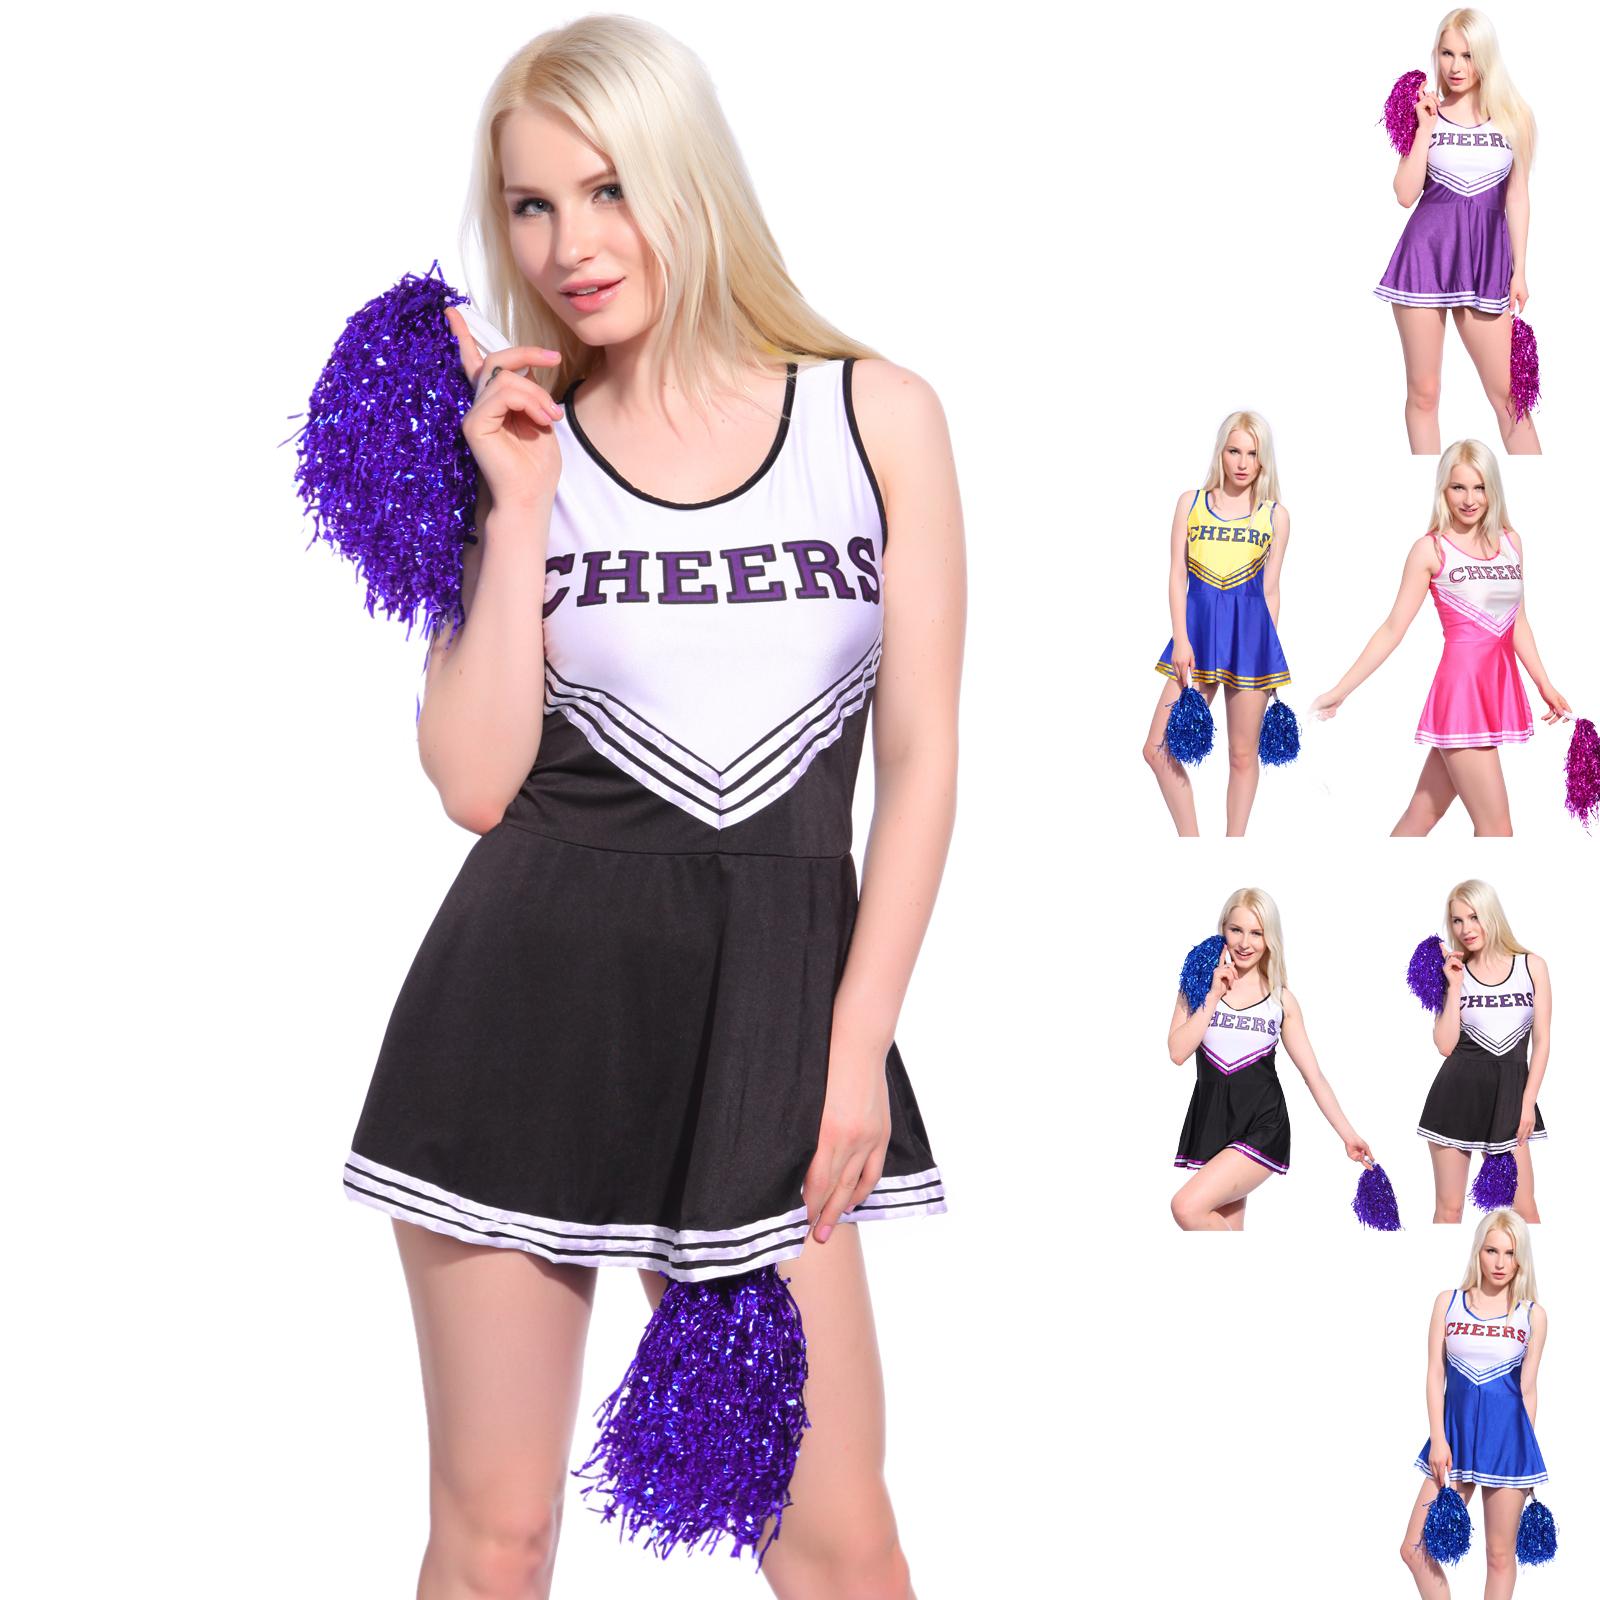 Girls Cheerleader Uniform School Girl Costume Full Outfits Fancy Dress Costume